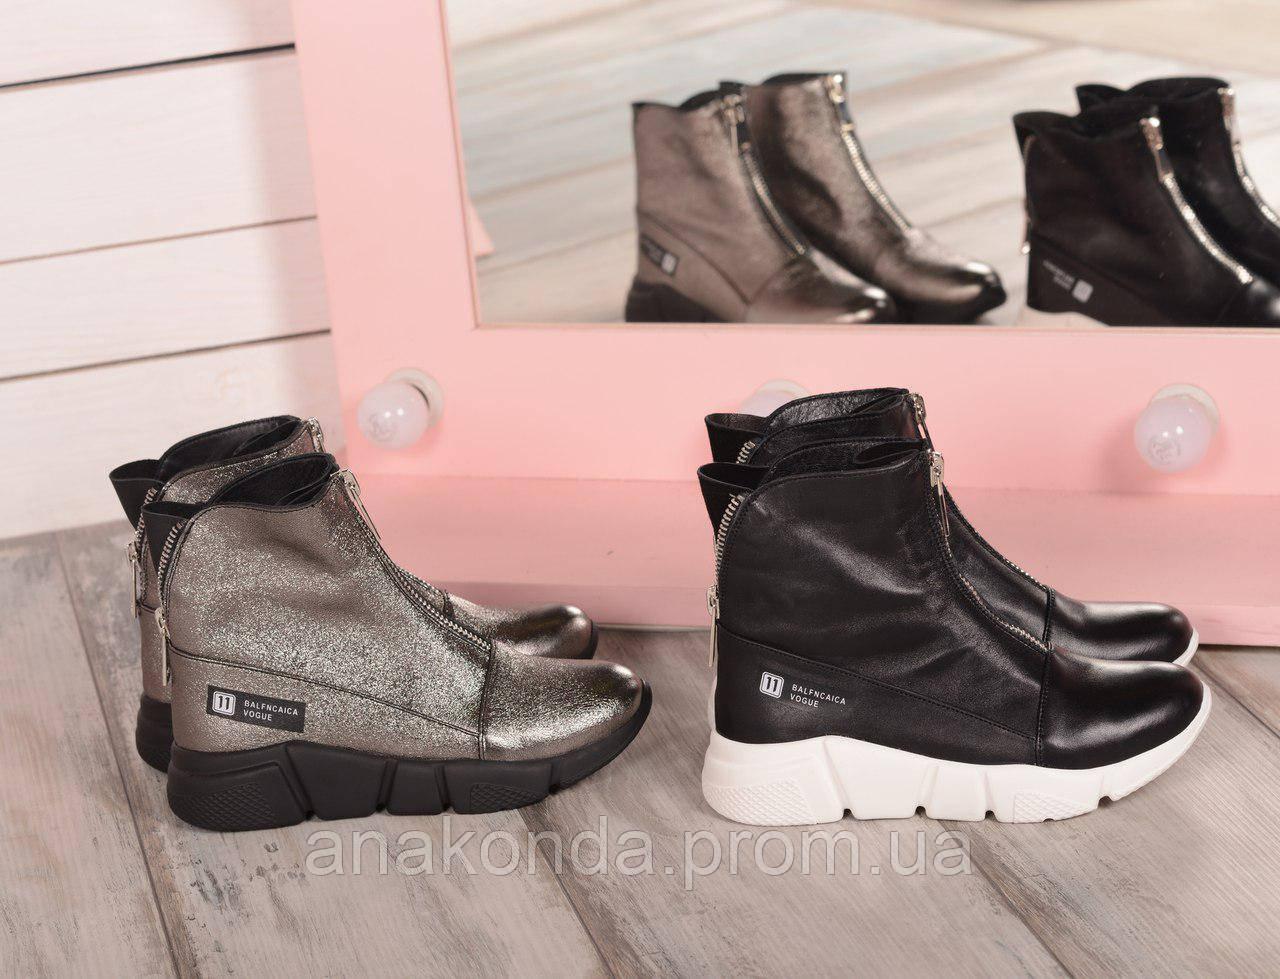 Ботинки спорт Balenciaga - Интернет - магазин